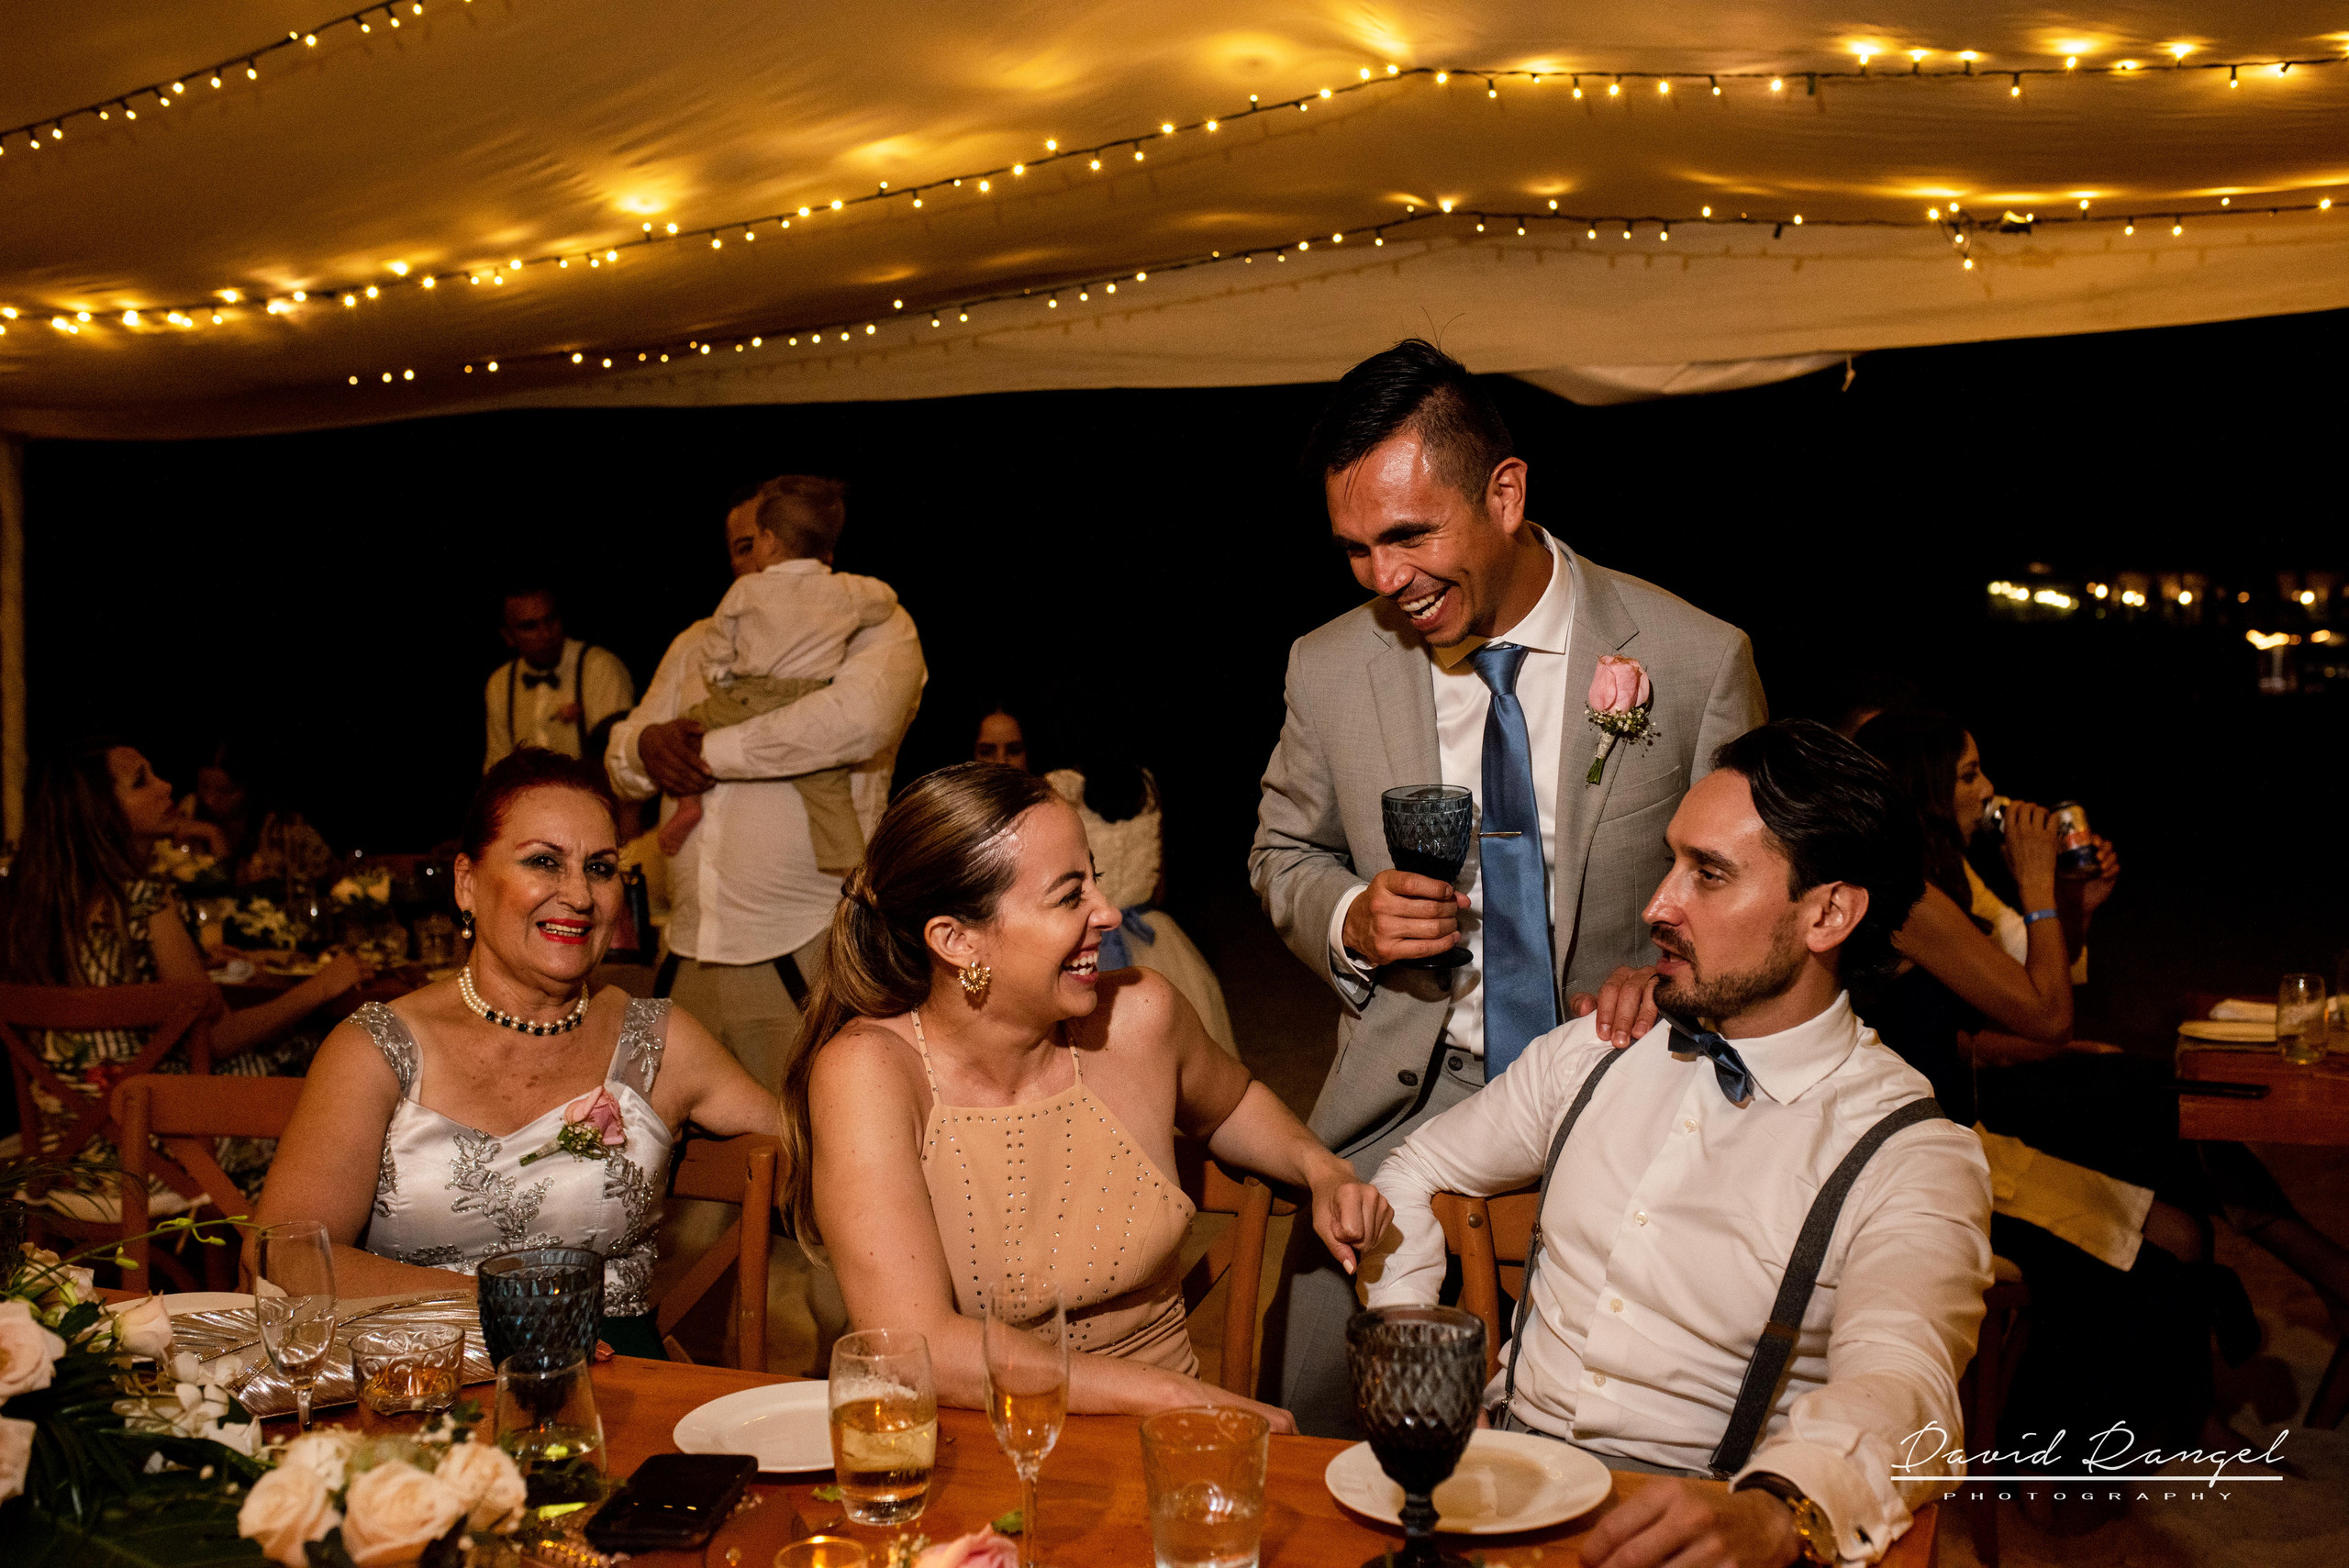 dinner+reception+wedding+guest+groom+bride